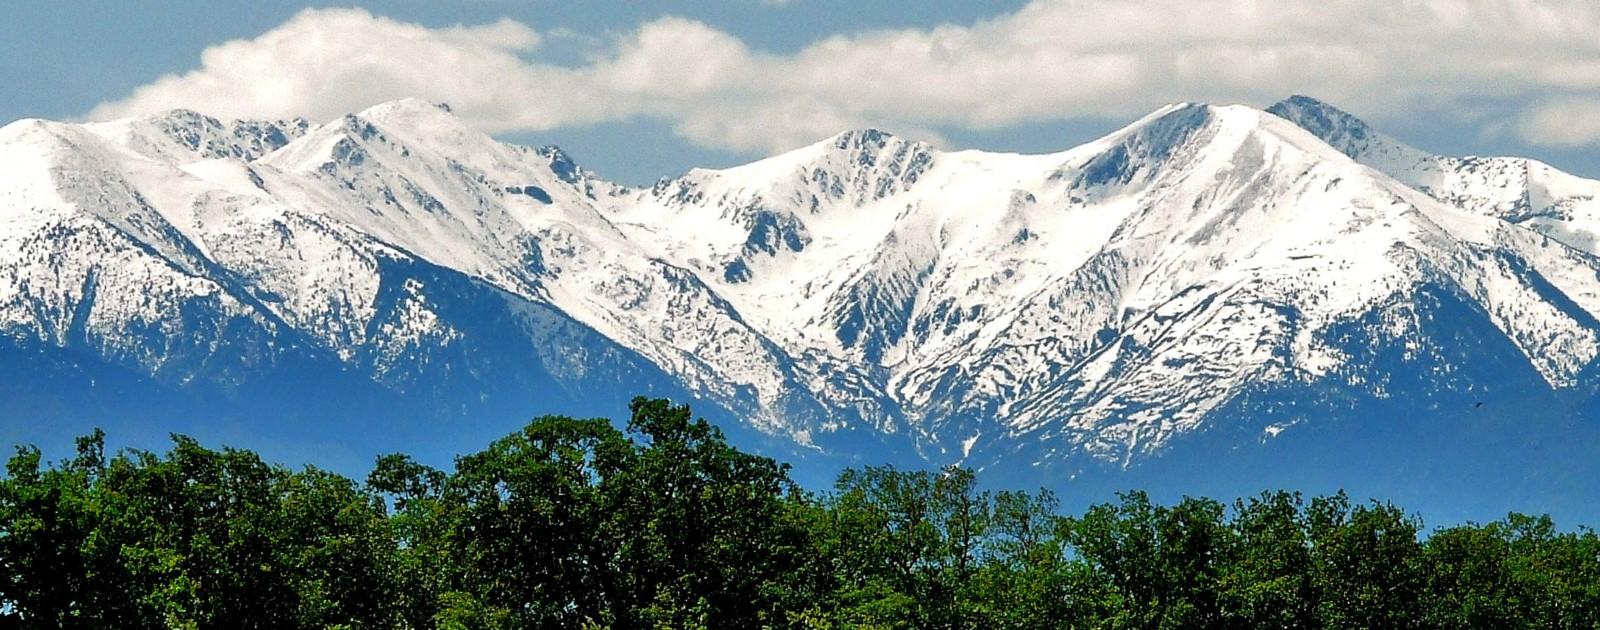 Les Pyrenees Orientales Laregionpyrenees Com